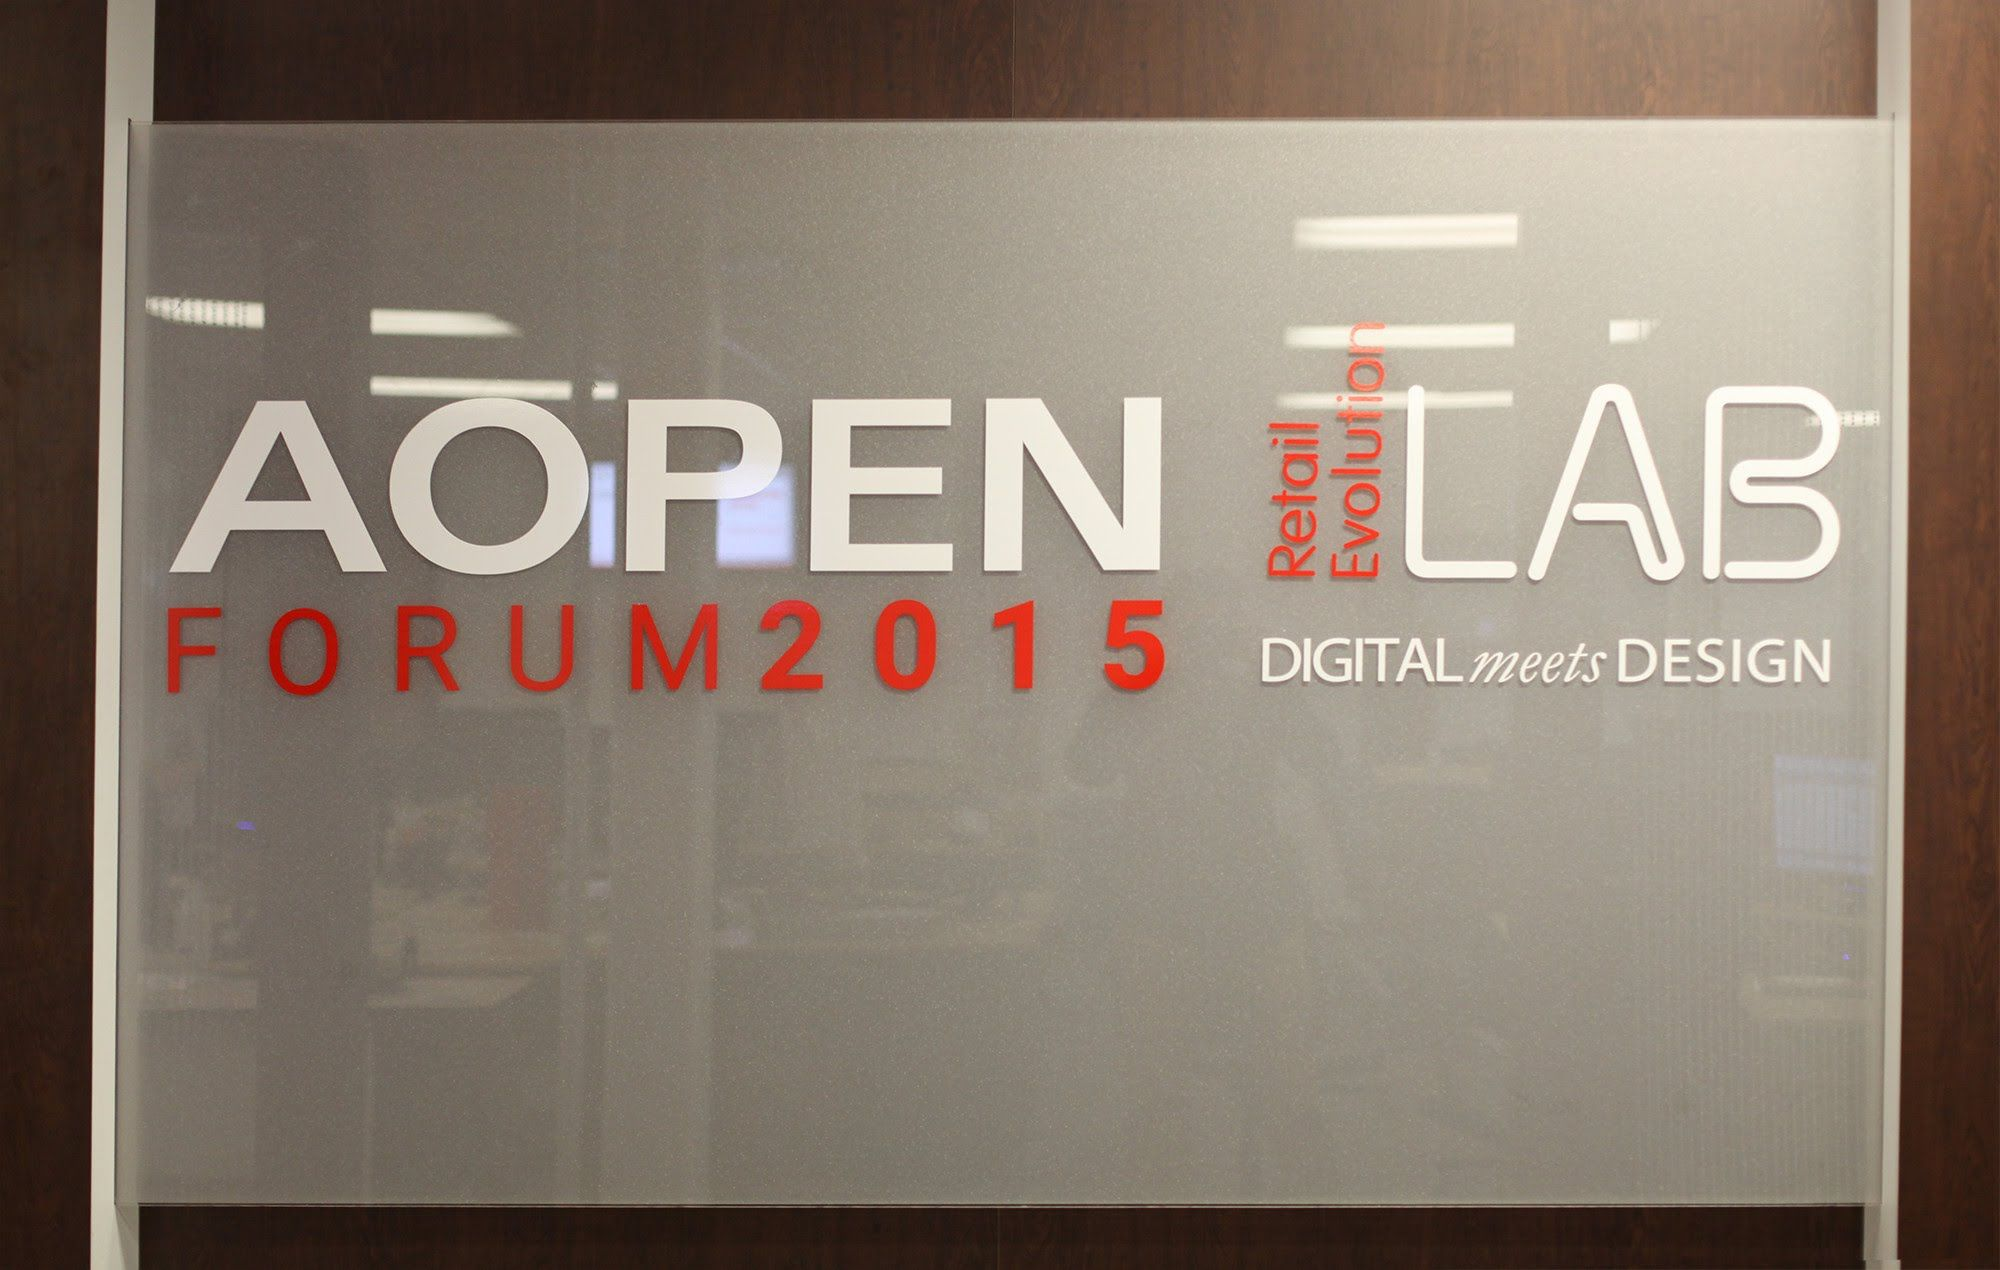 AOPEN Forum 2015 / Retail Evolution Lab Highlights